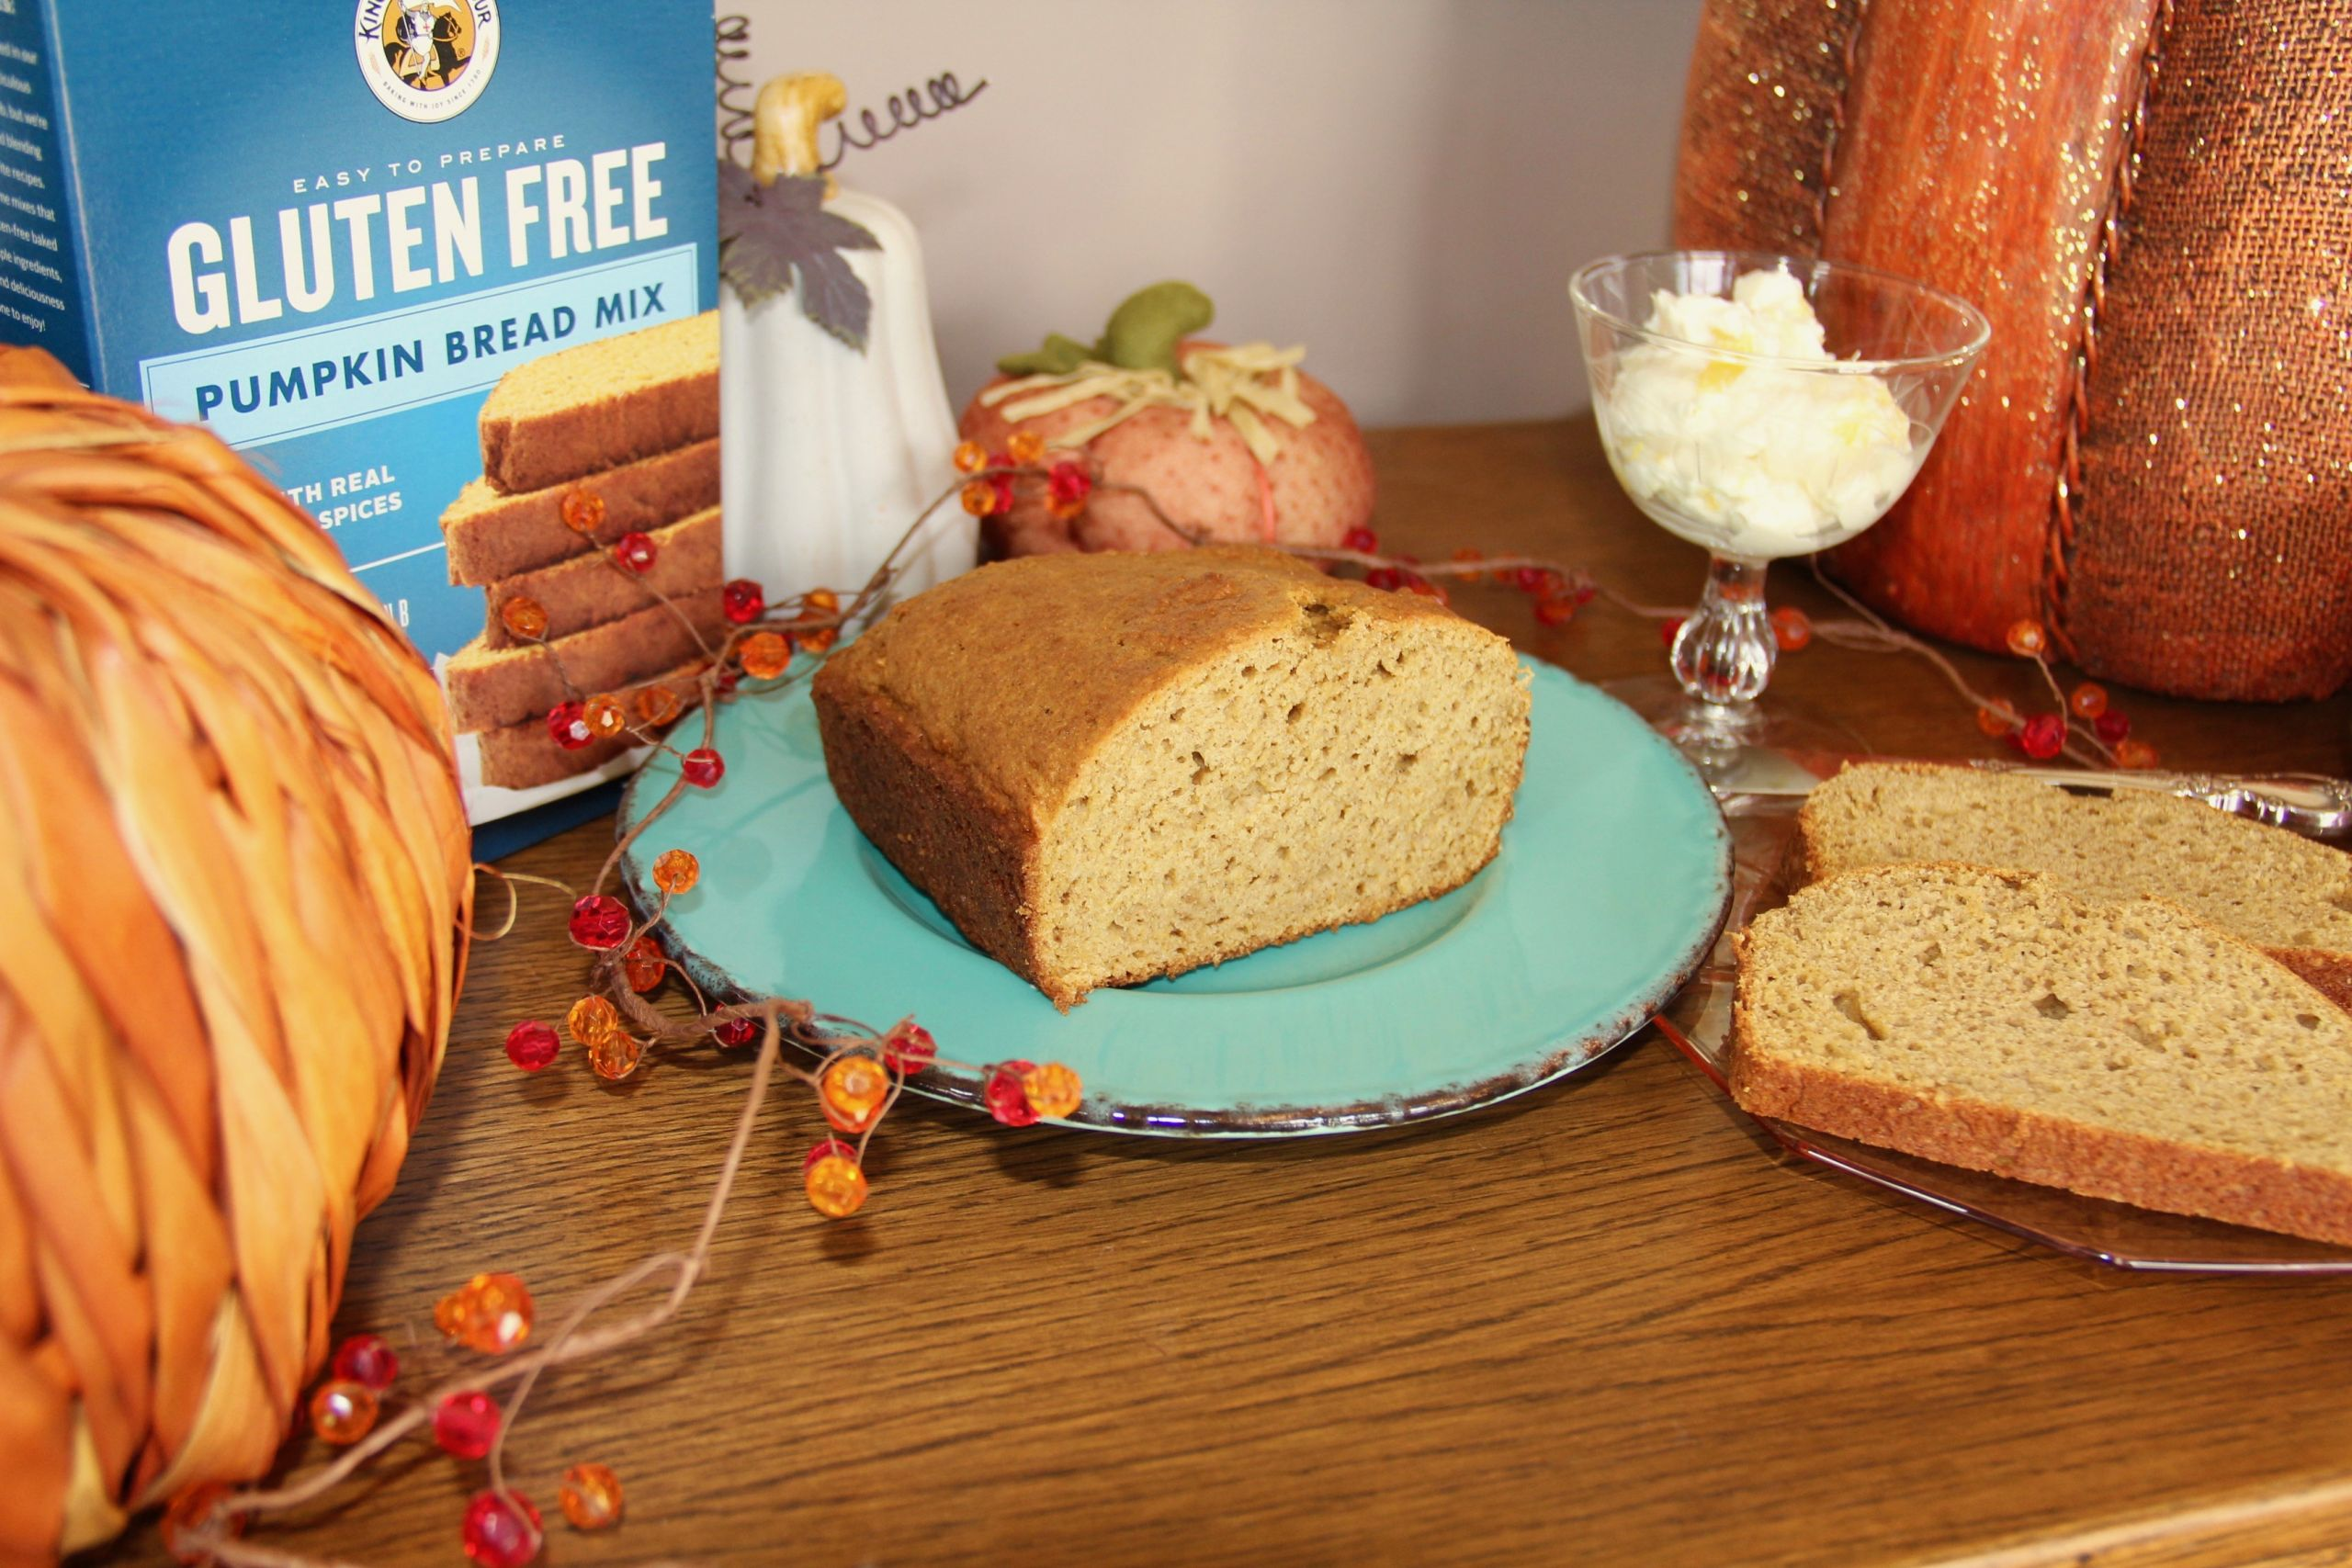 King Arthur Gluten Free Bread  Pumpkin Bread King Arthur Flour Unexpected Discoveries